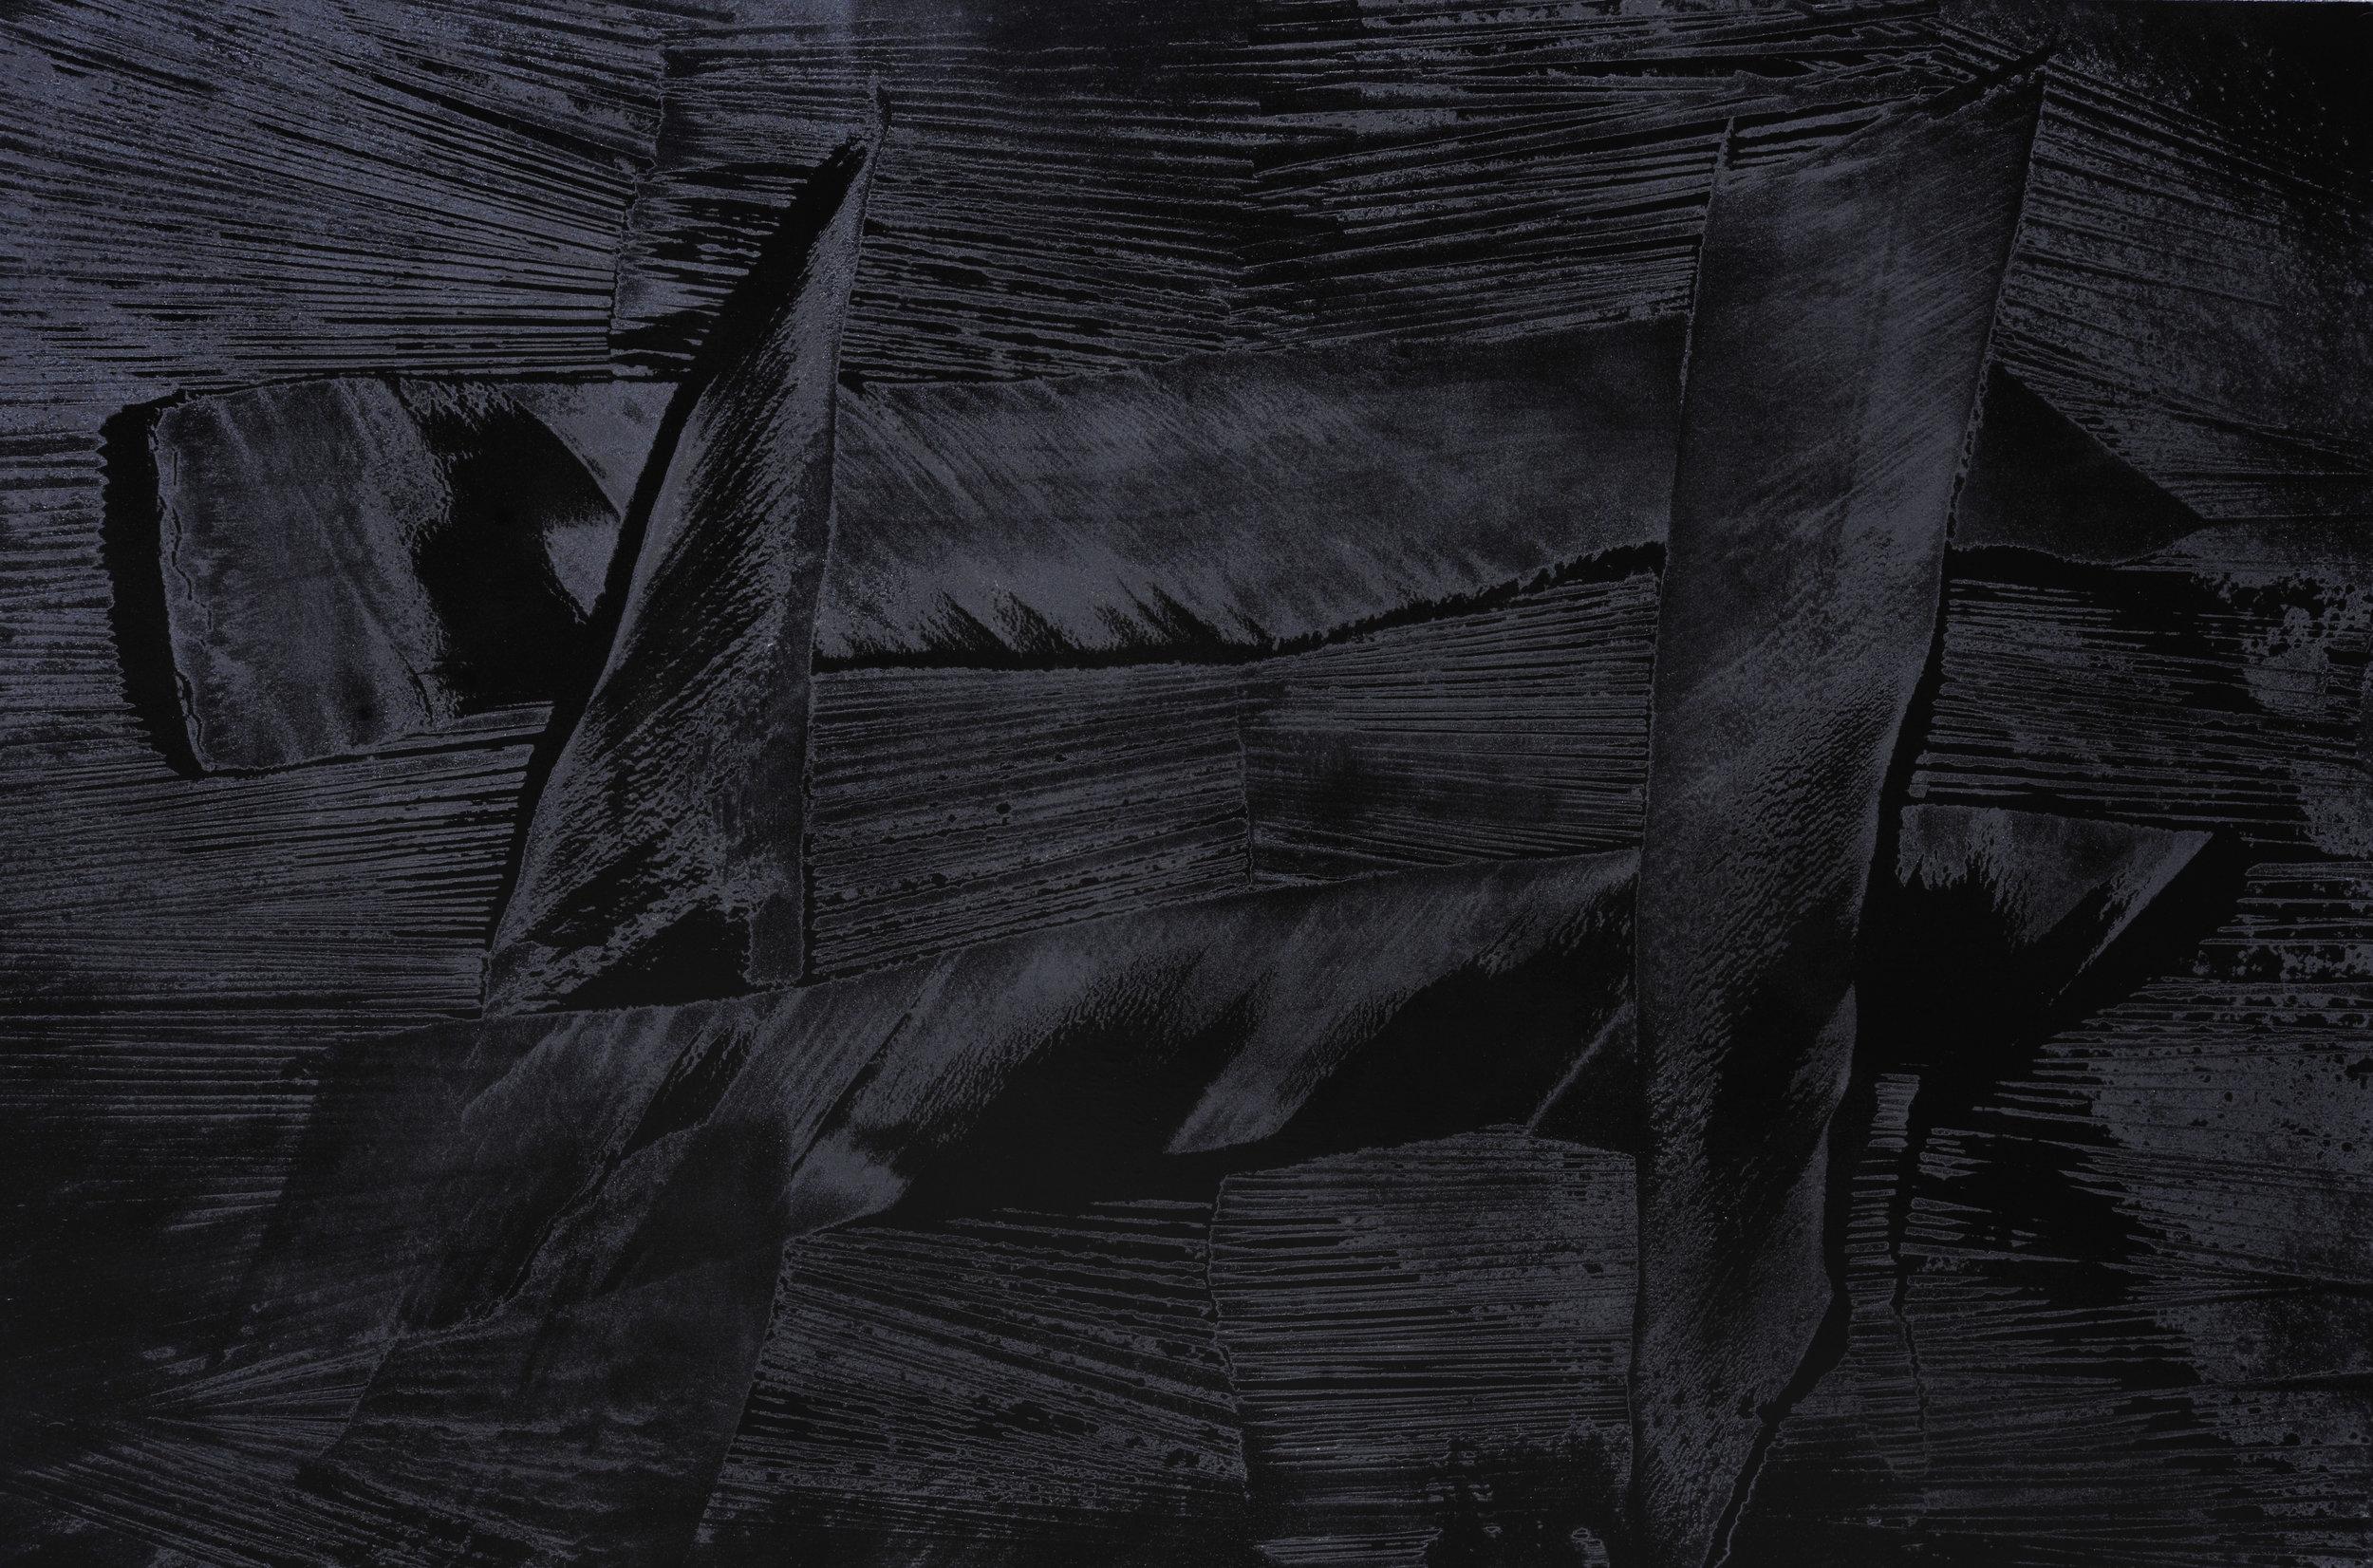 Black Void No. 3, 2016, 194cm x 130cm 120F, Oil on Canvas.jpg